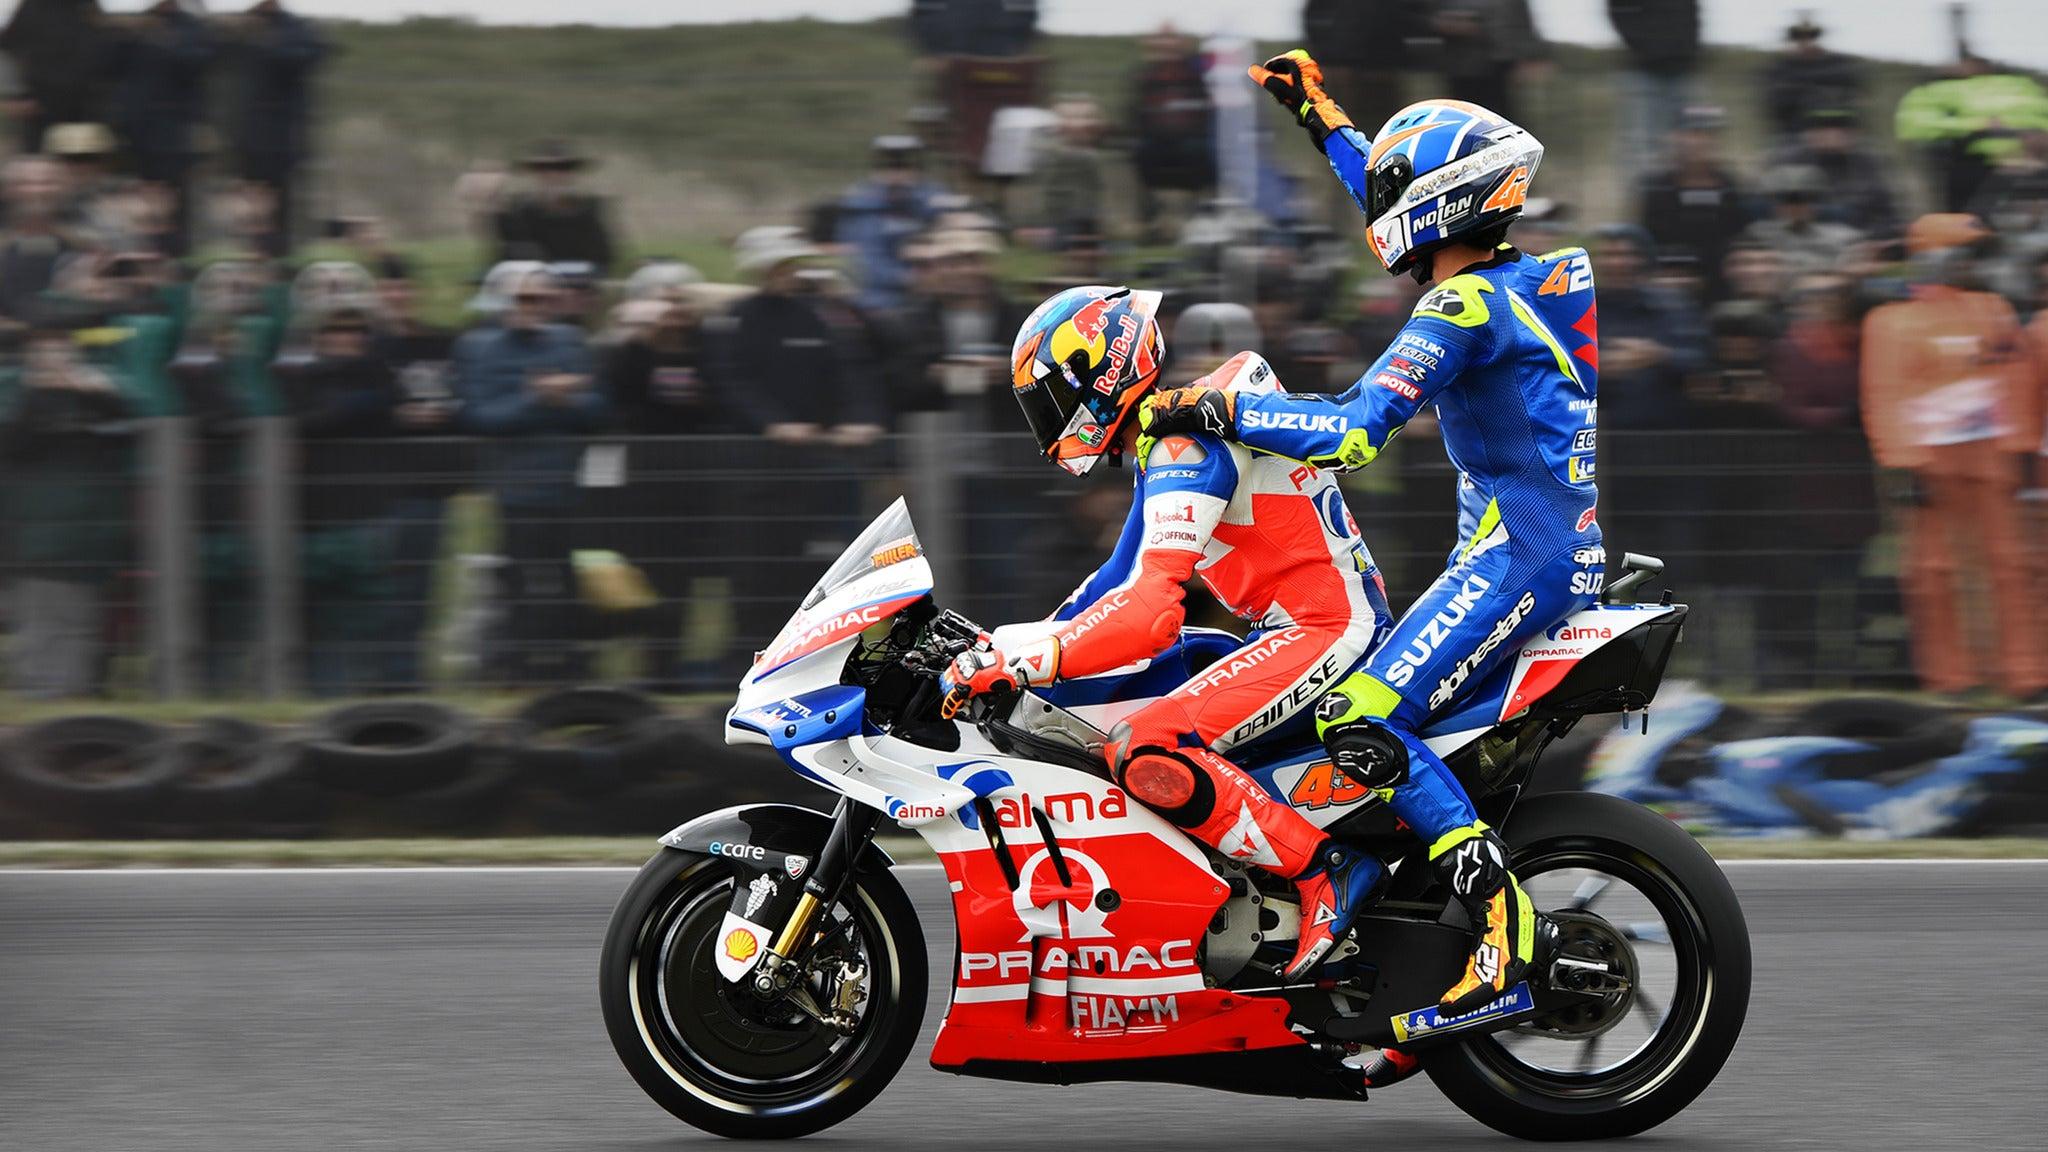 Pramac Generac Australian MotoGP - Gardner Straight Stand (3 Day Pass)